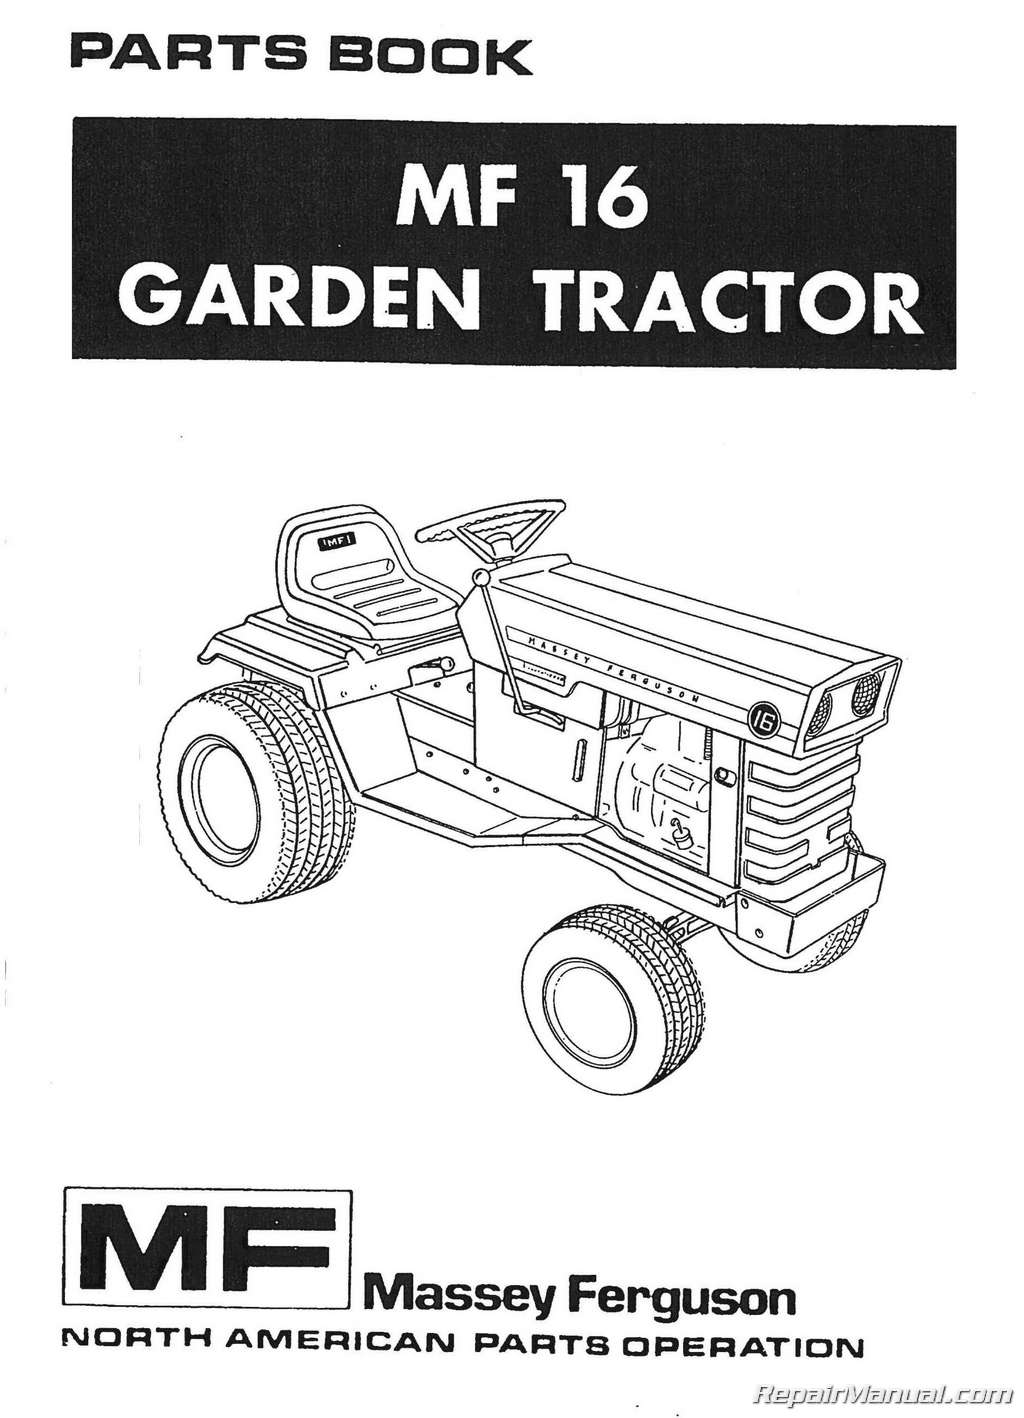 Js Mh P Mf on Massey Ferguson Parts Catalog